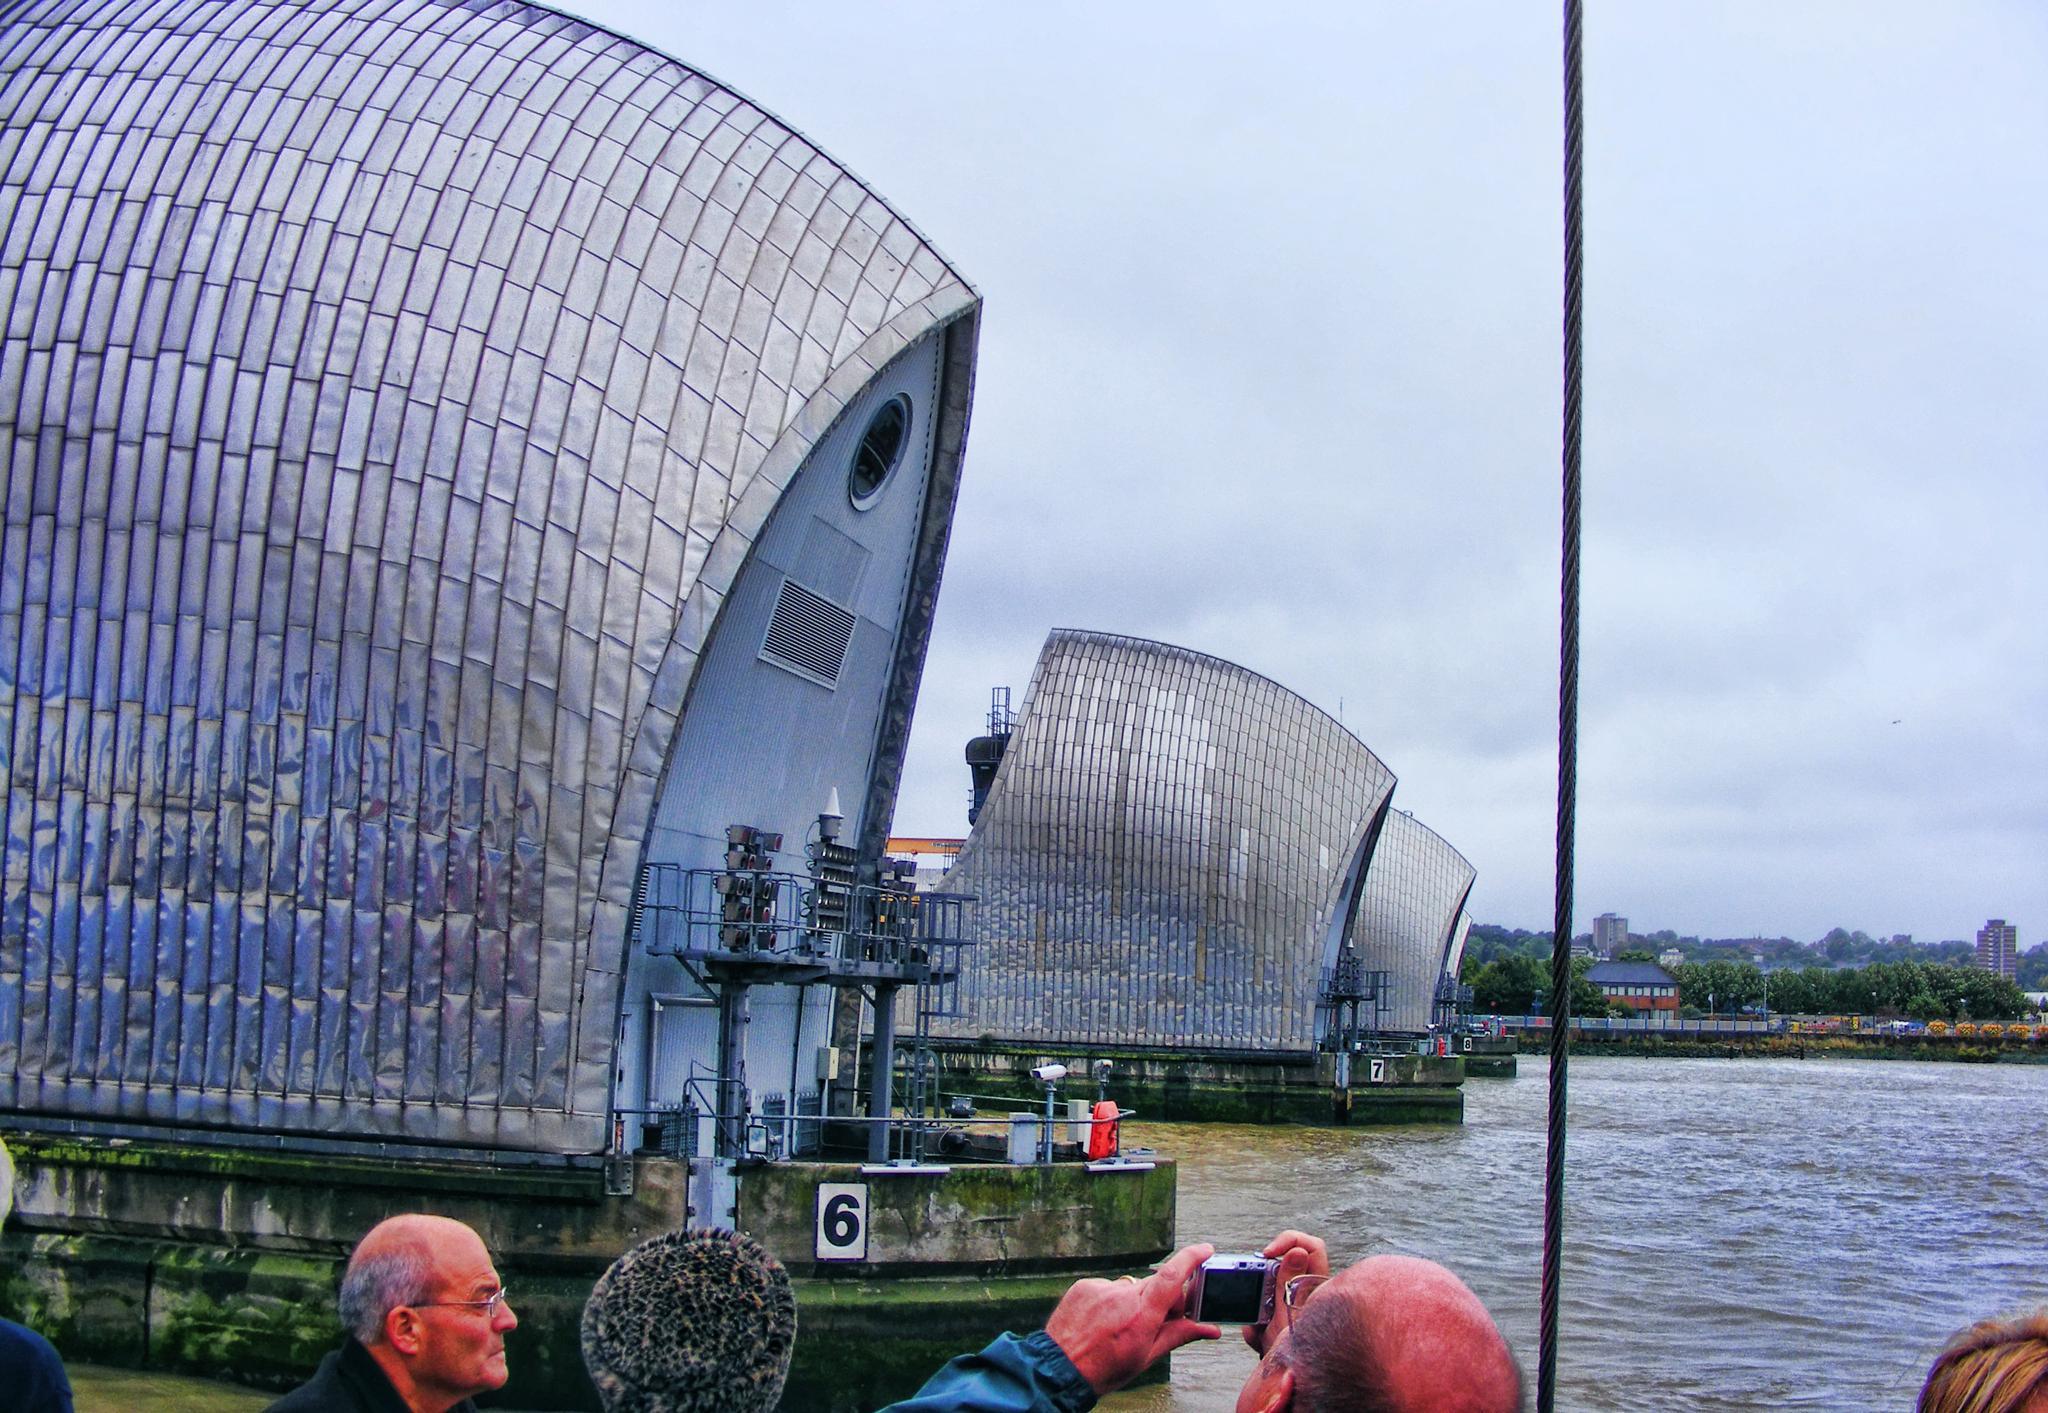 Thames flood barrier  by keve E